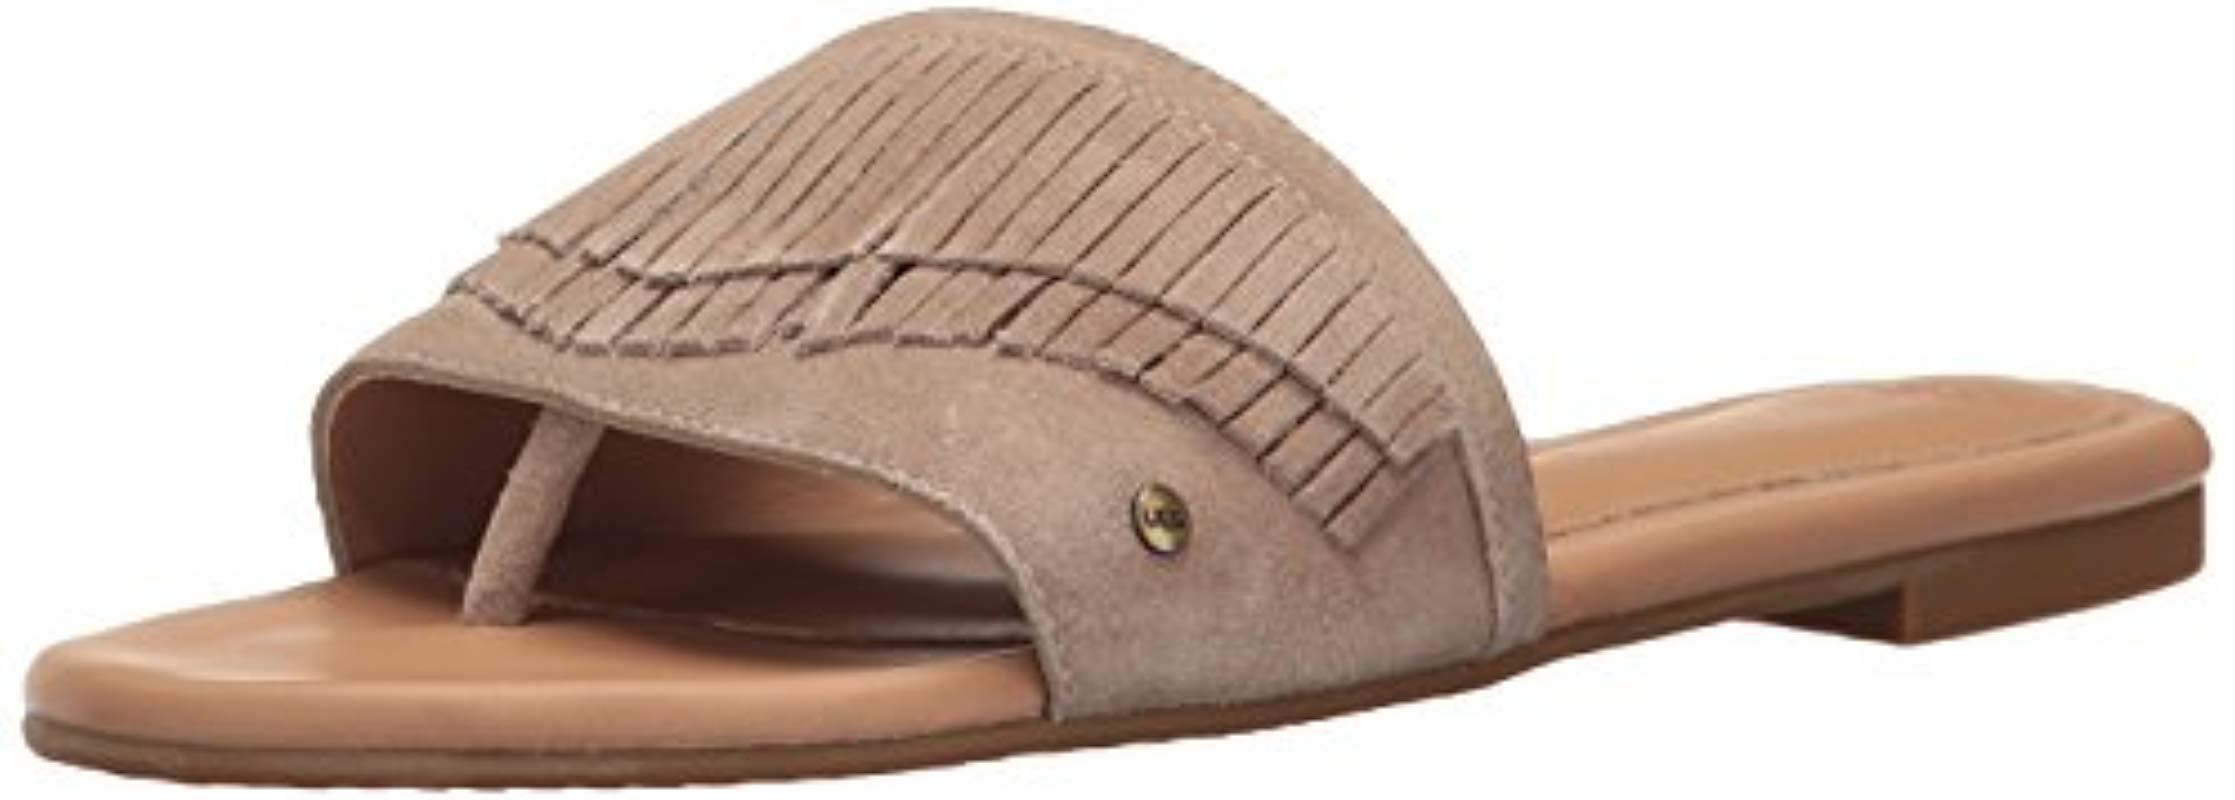 f50936de9610 Lyst - UGG Binx Flat Sandal - Save 1%